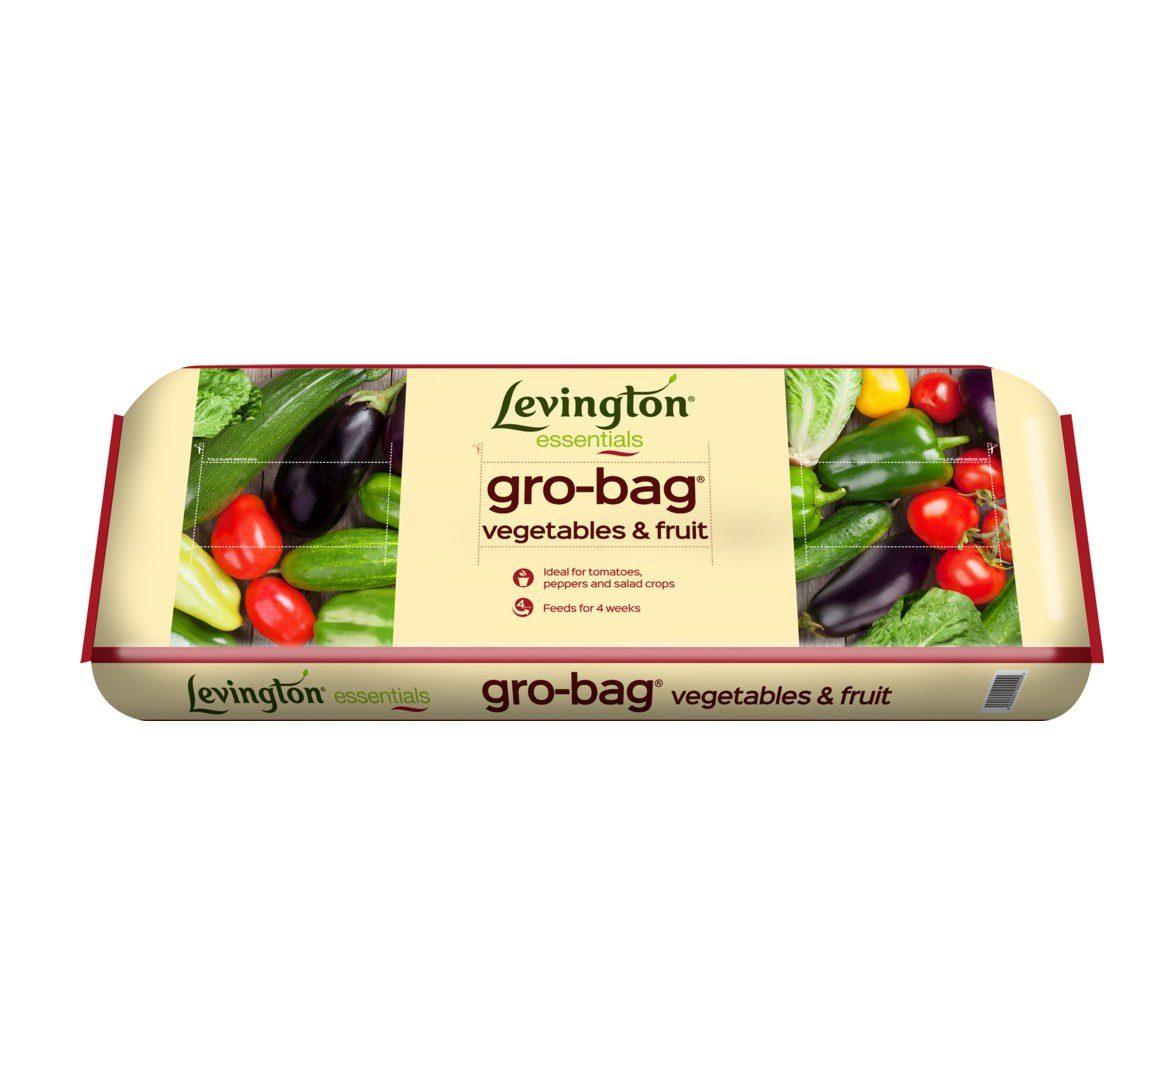 Levington Essentials Gro-Bag